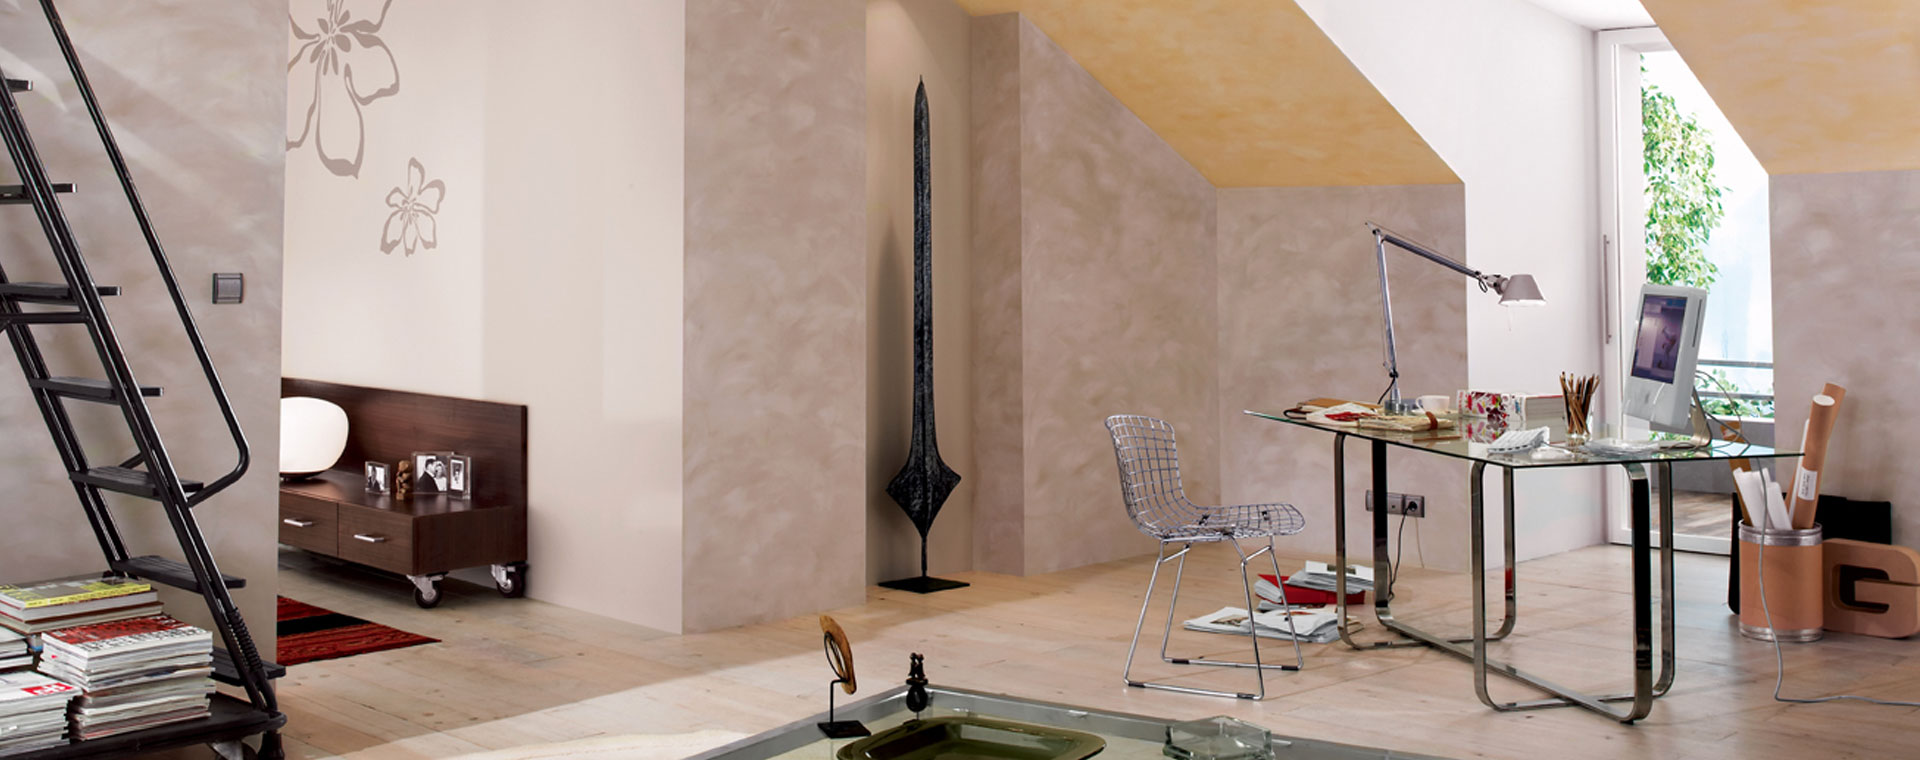 loic prevost peinture yvetot enduits et d coration. Black Bedroom Furniture Sets. Home Design Ideas